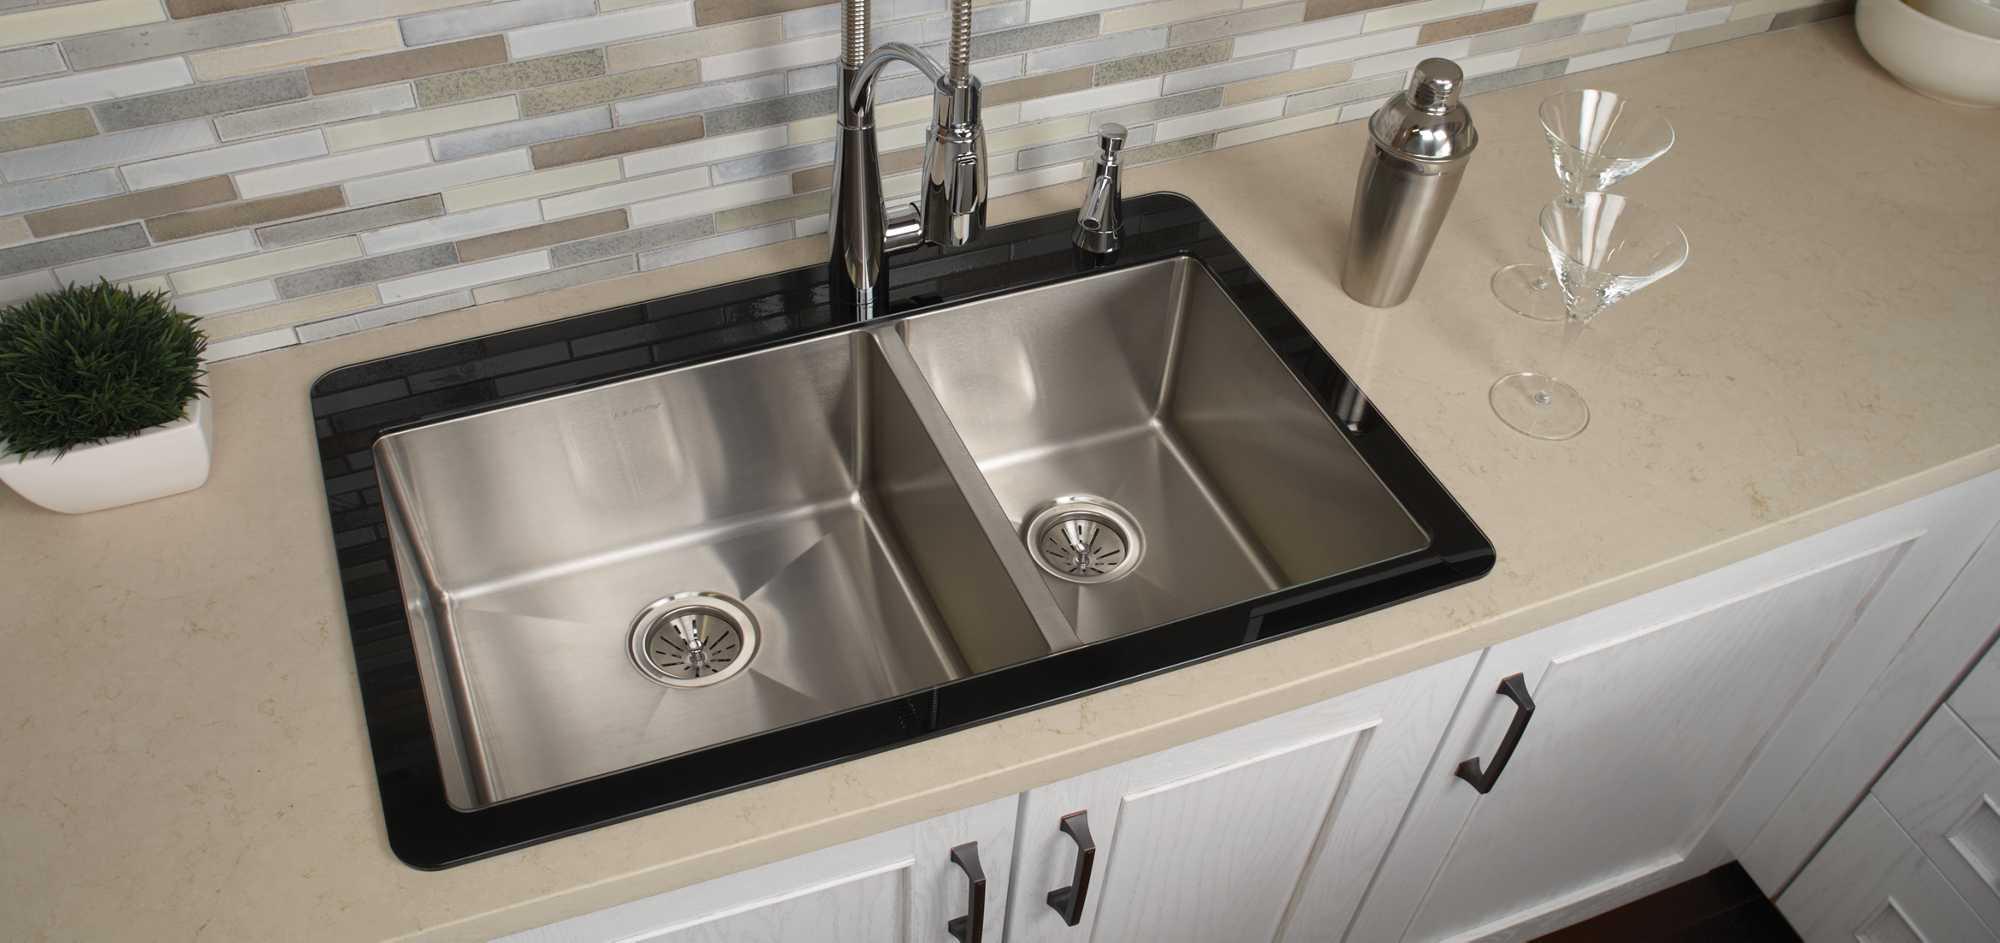 Crosstown Stainless Steel Kitchen Sinks | Elkay